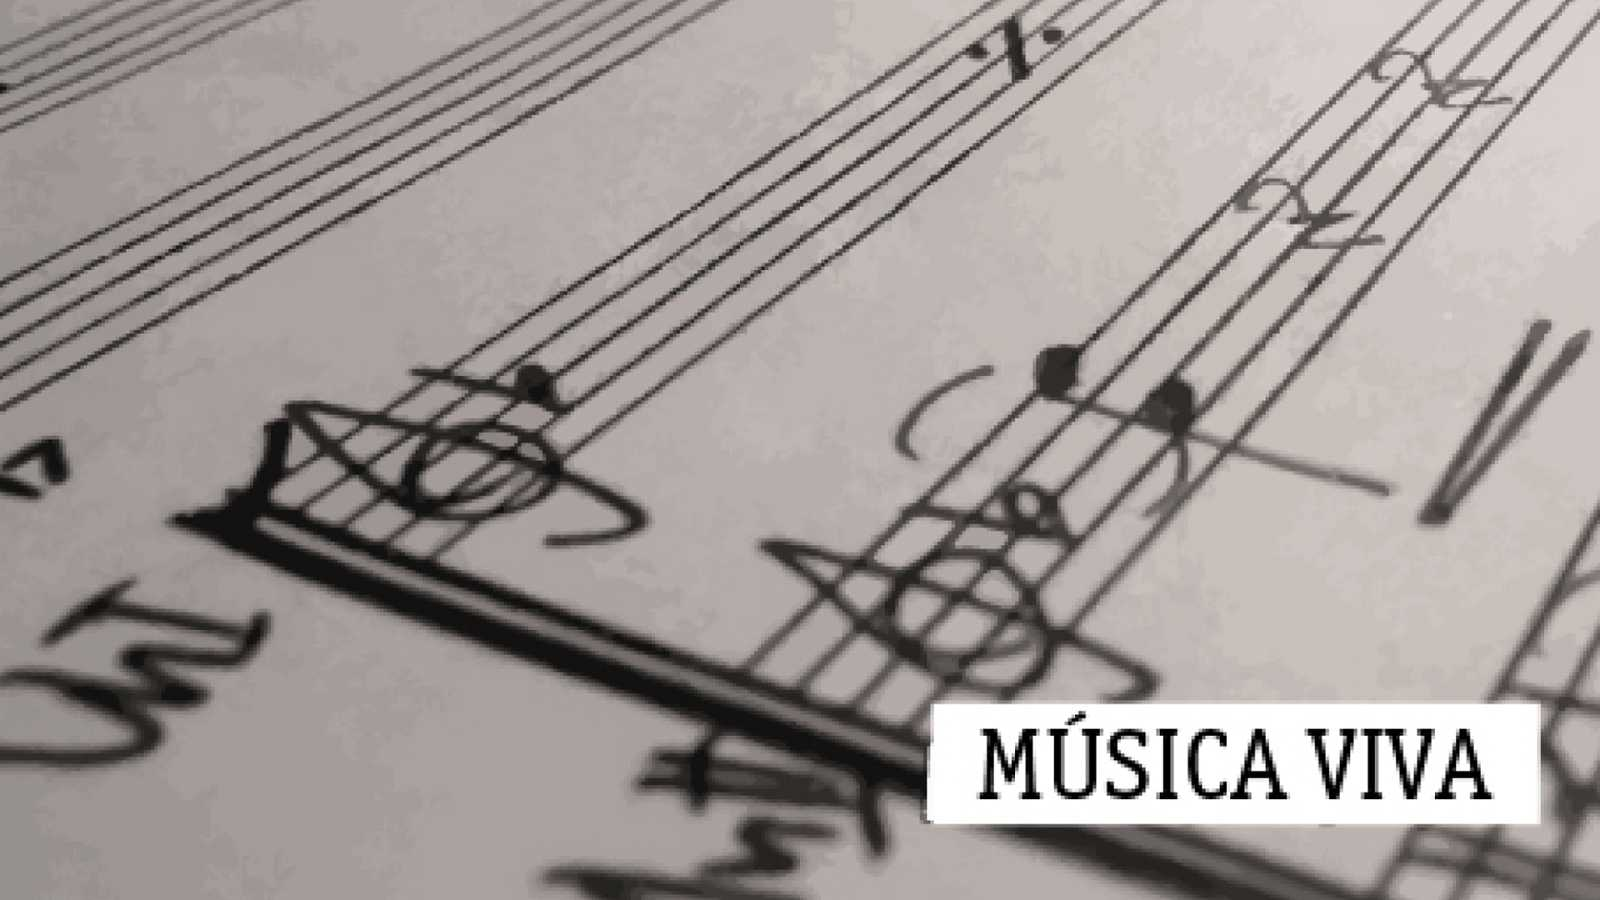 Música viva - Temas de música viva: antigua vs contemporánea - 27/10/19 - escuchar ahora